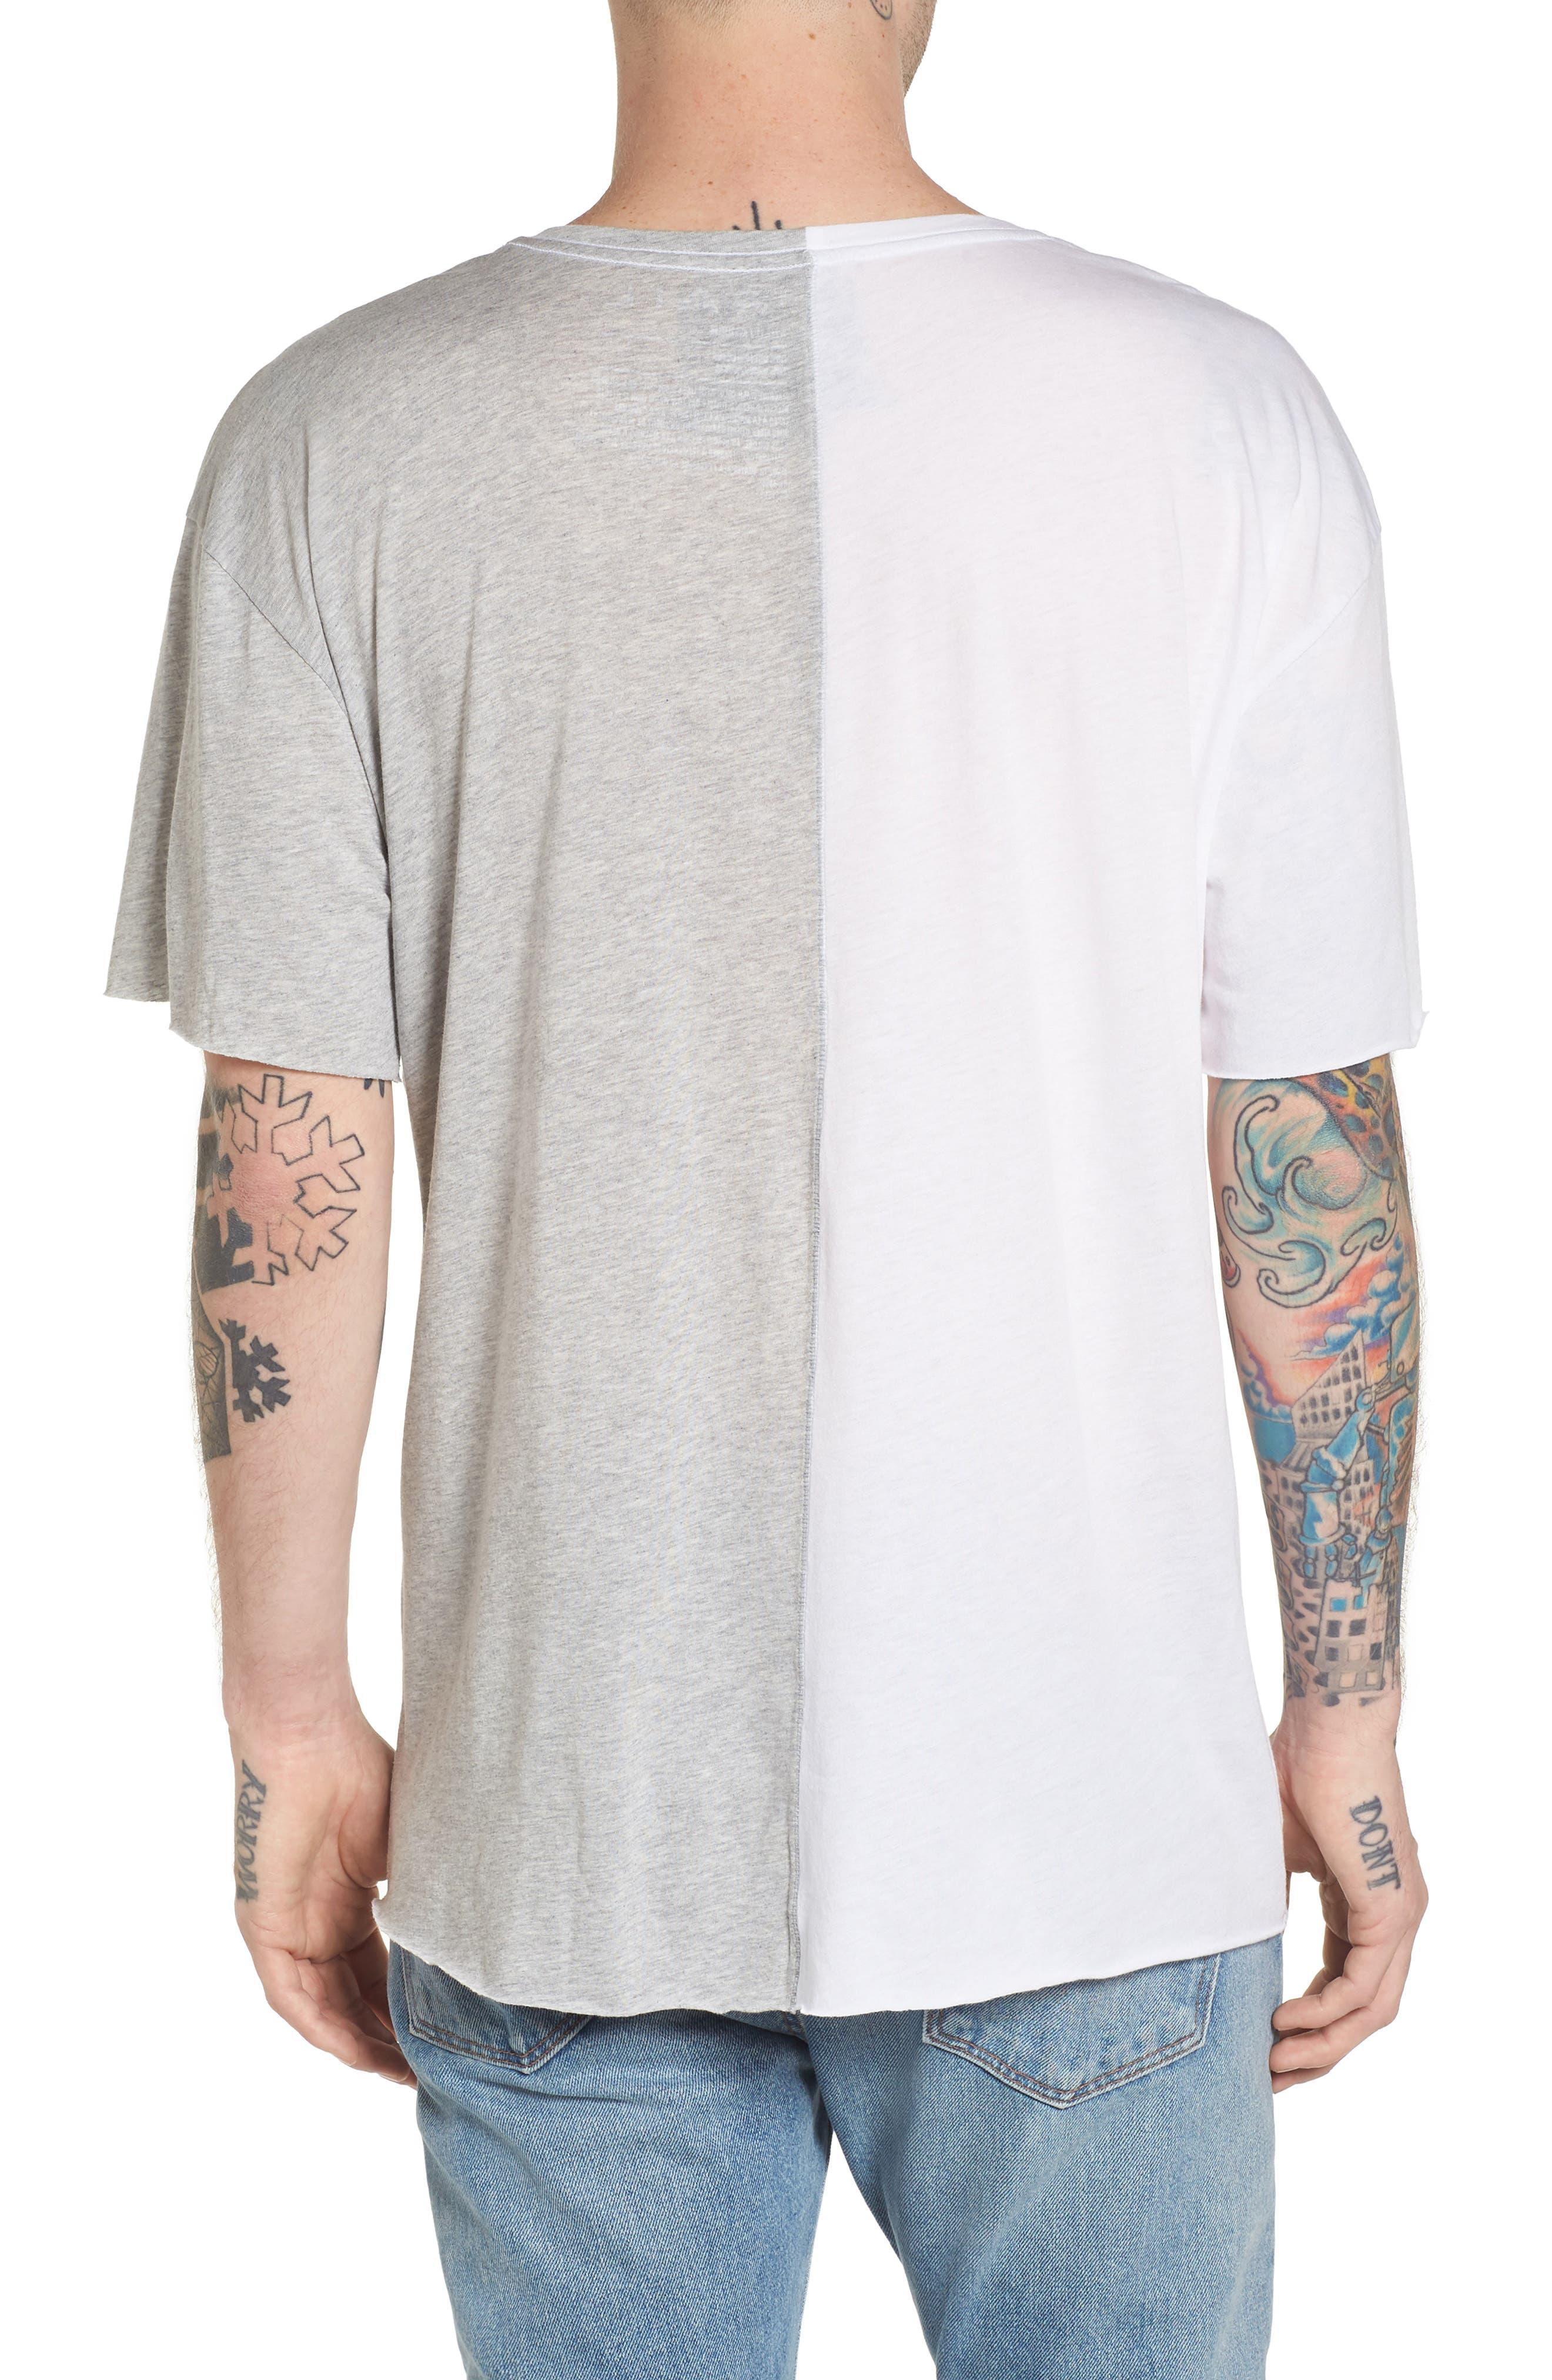 Boxy Splice T-Shirt,                             Alternate thumbnail 2, color,                             White/ Grey Heather